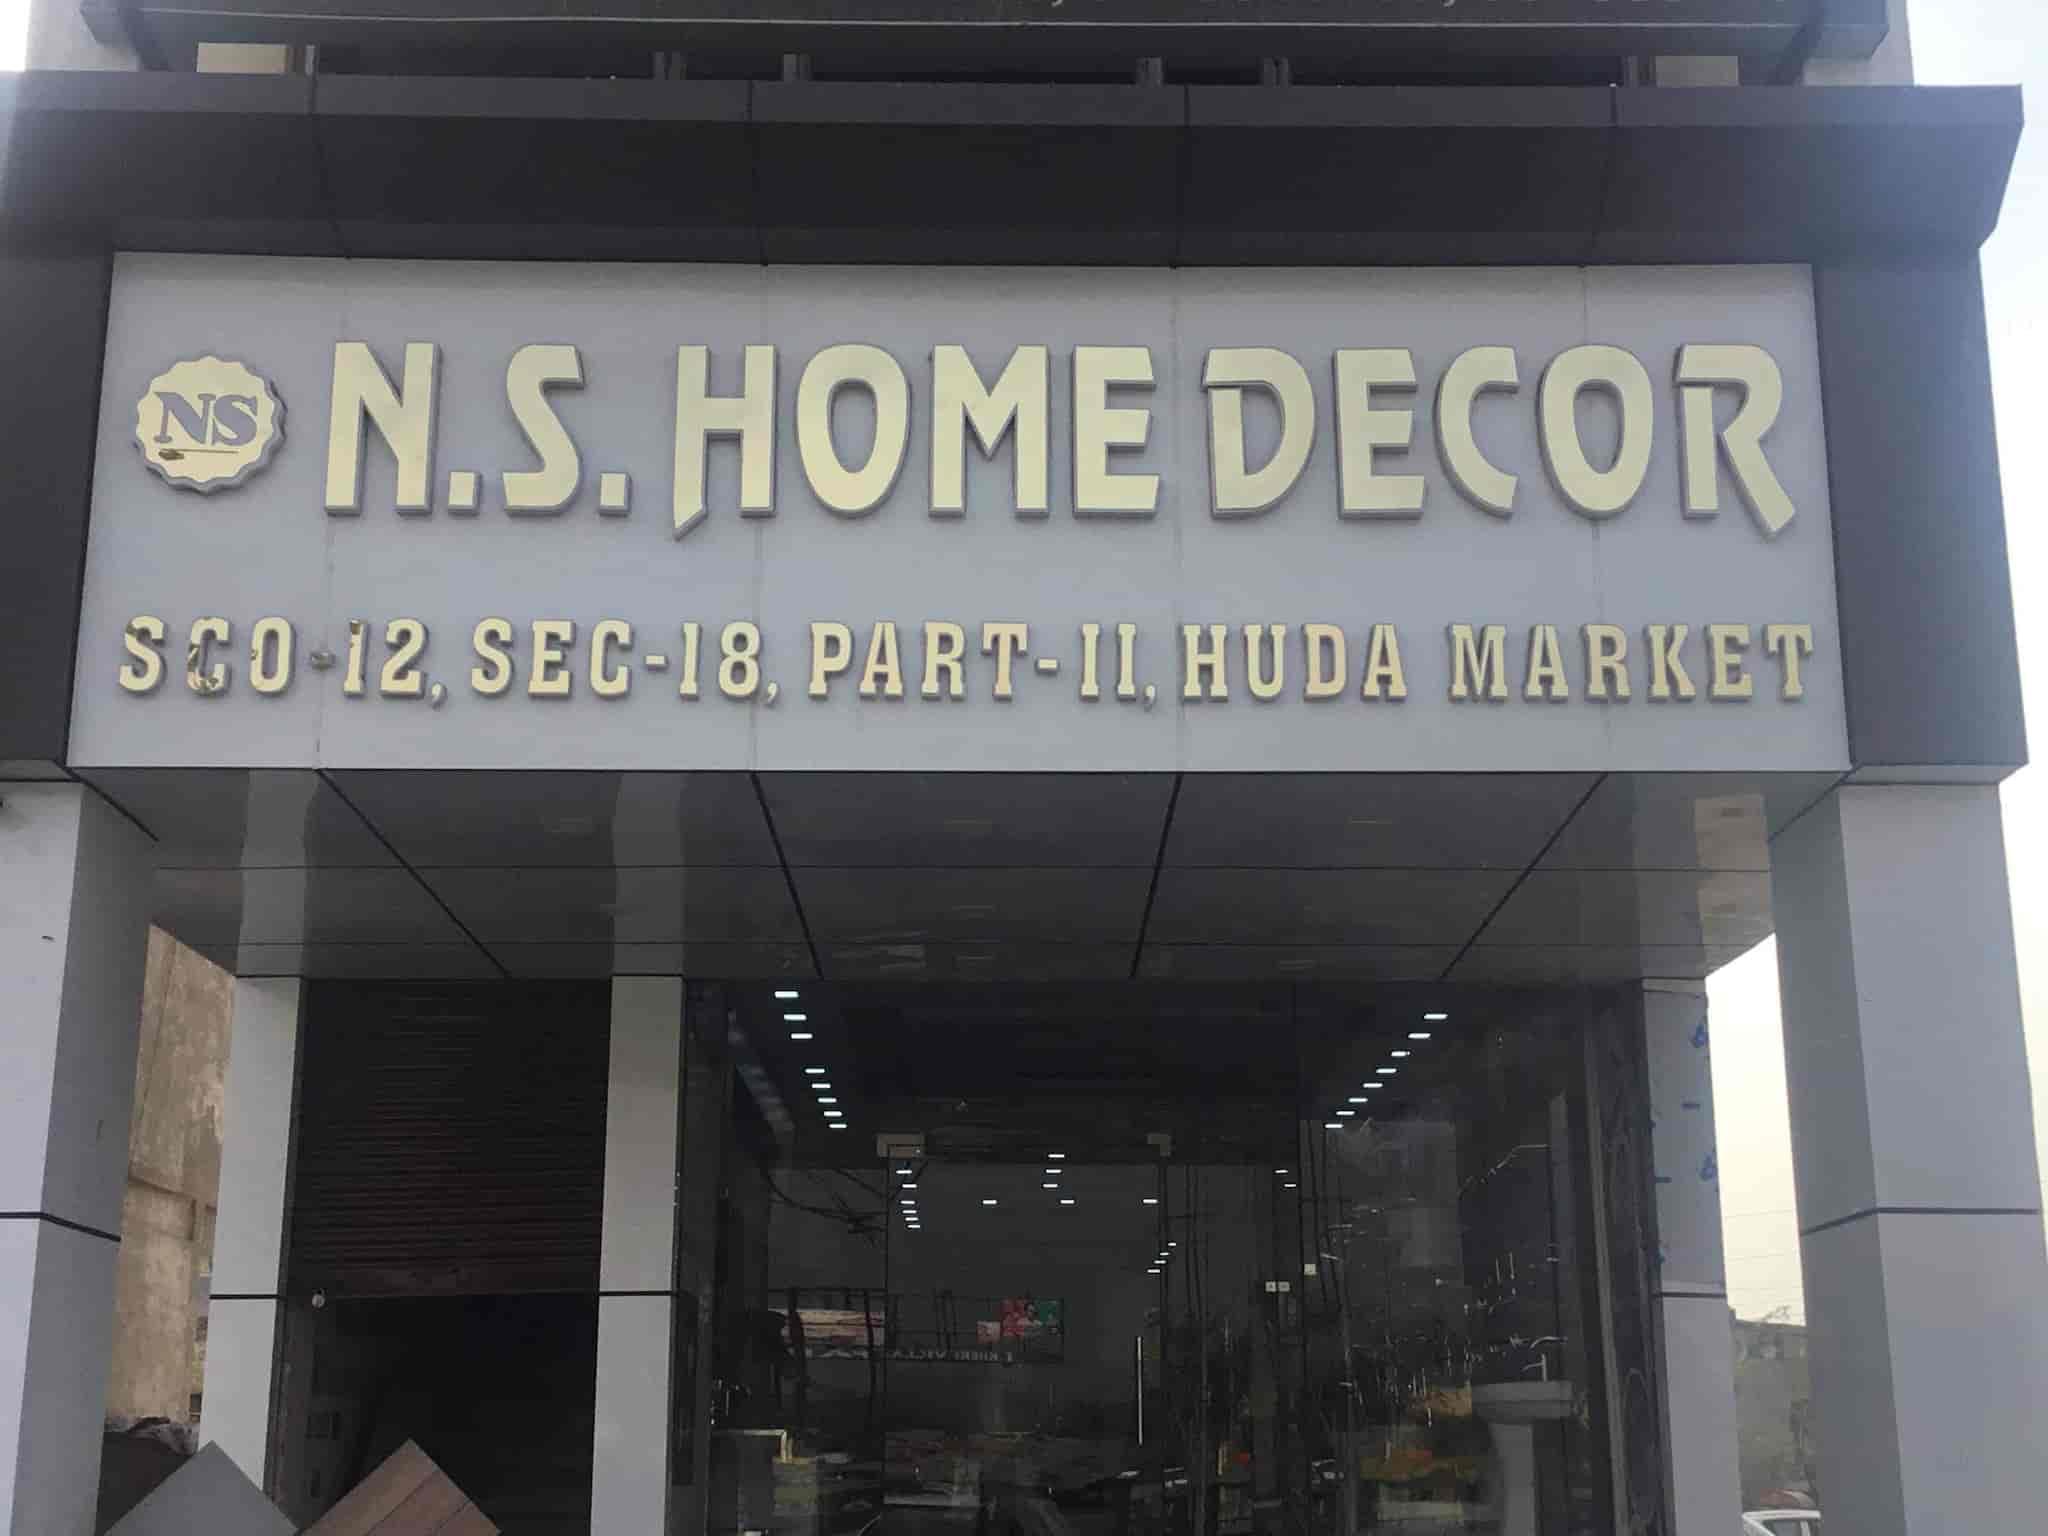 ... N S Home Decor U0026 Hardware Store Photos, Old, Delhi   Hardware Shops ...